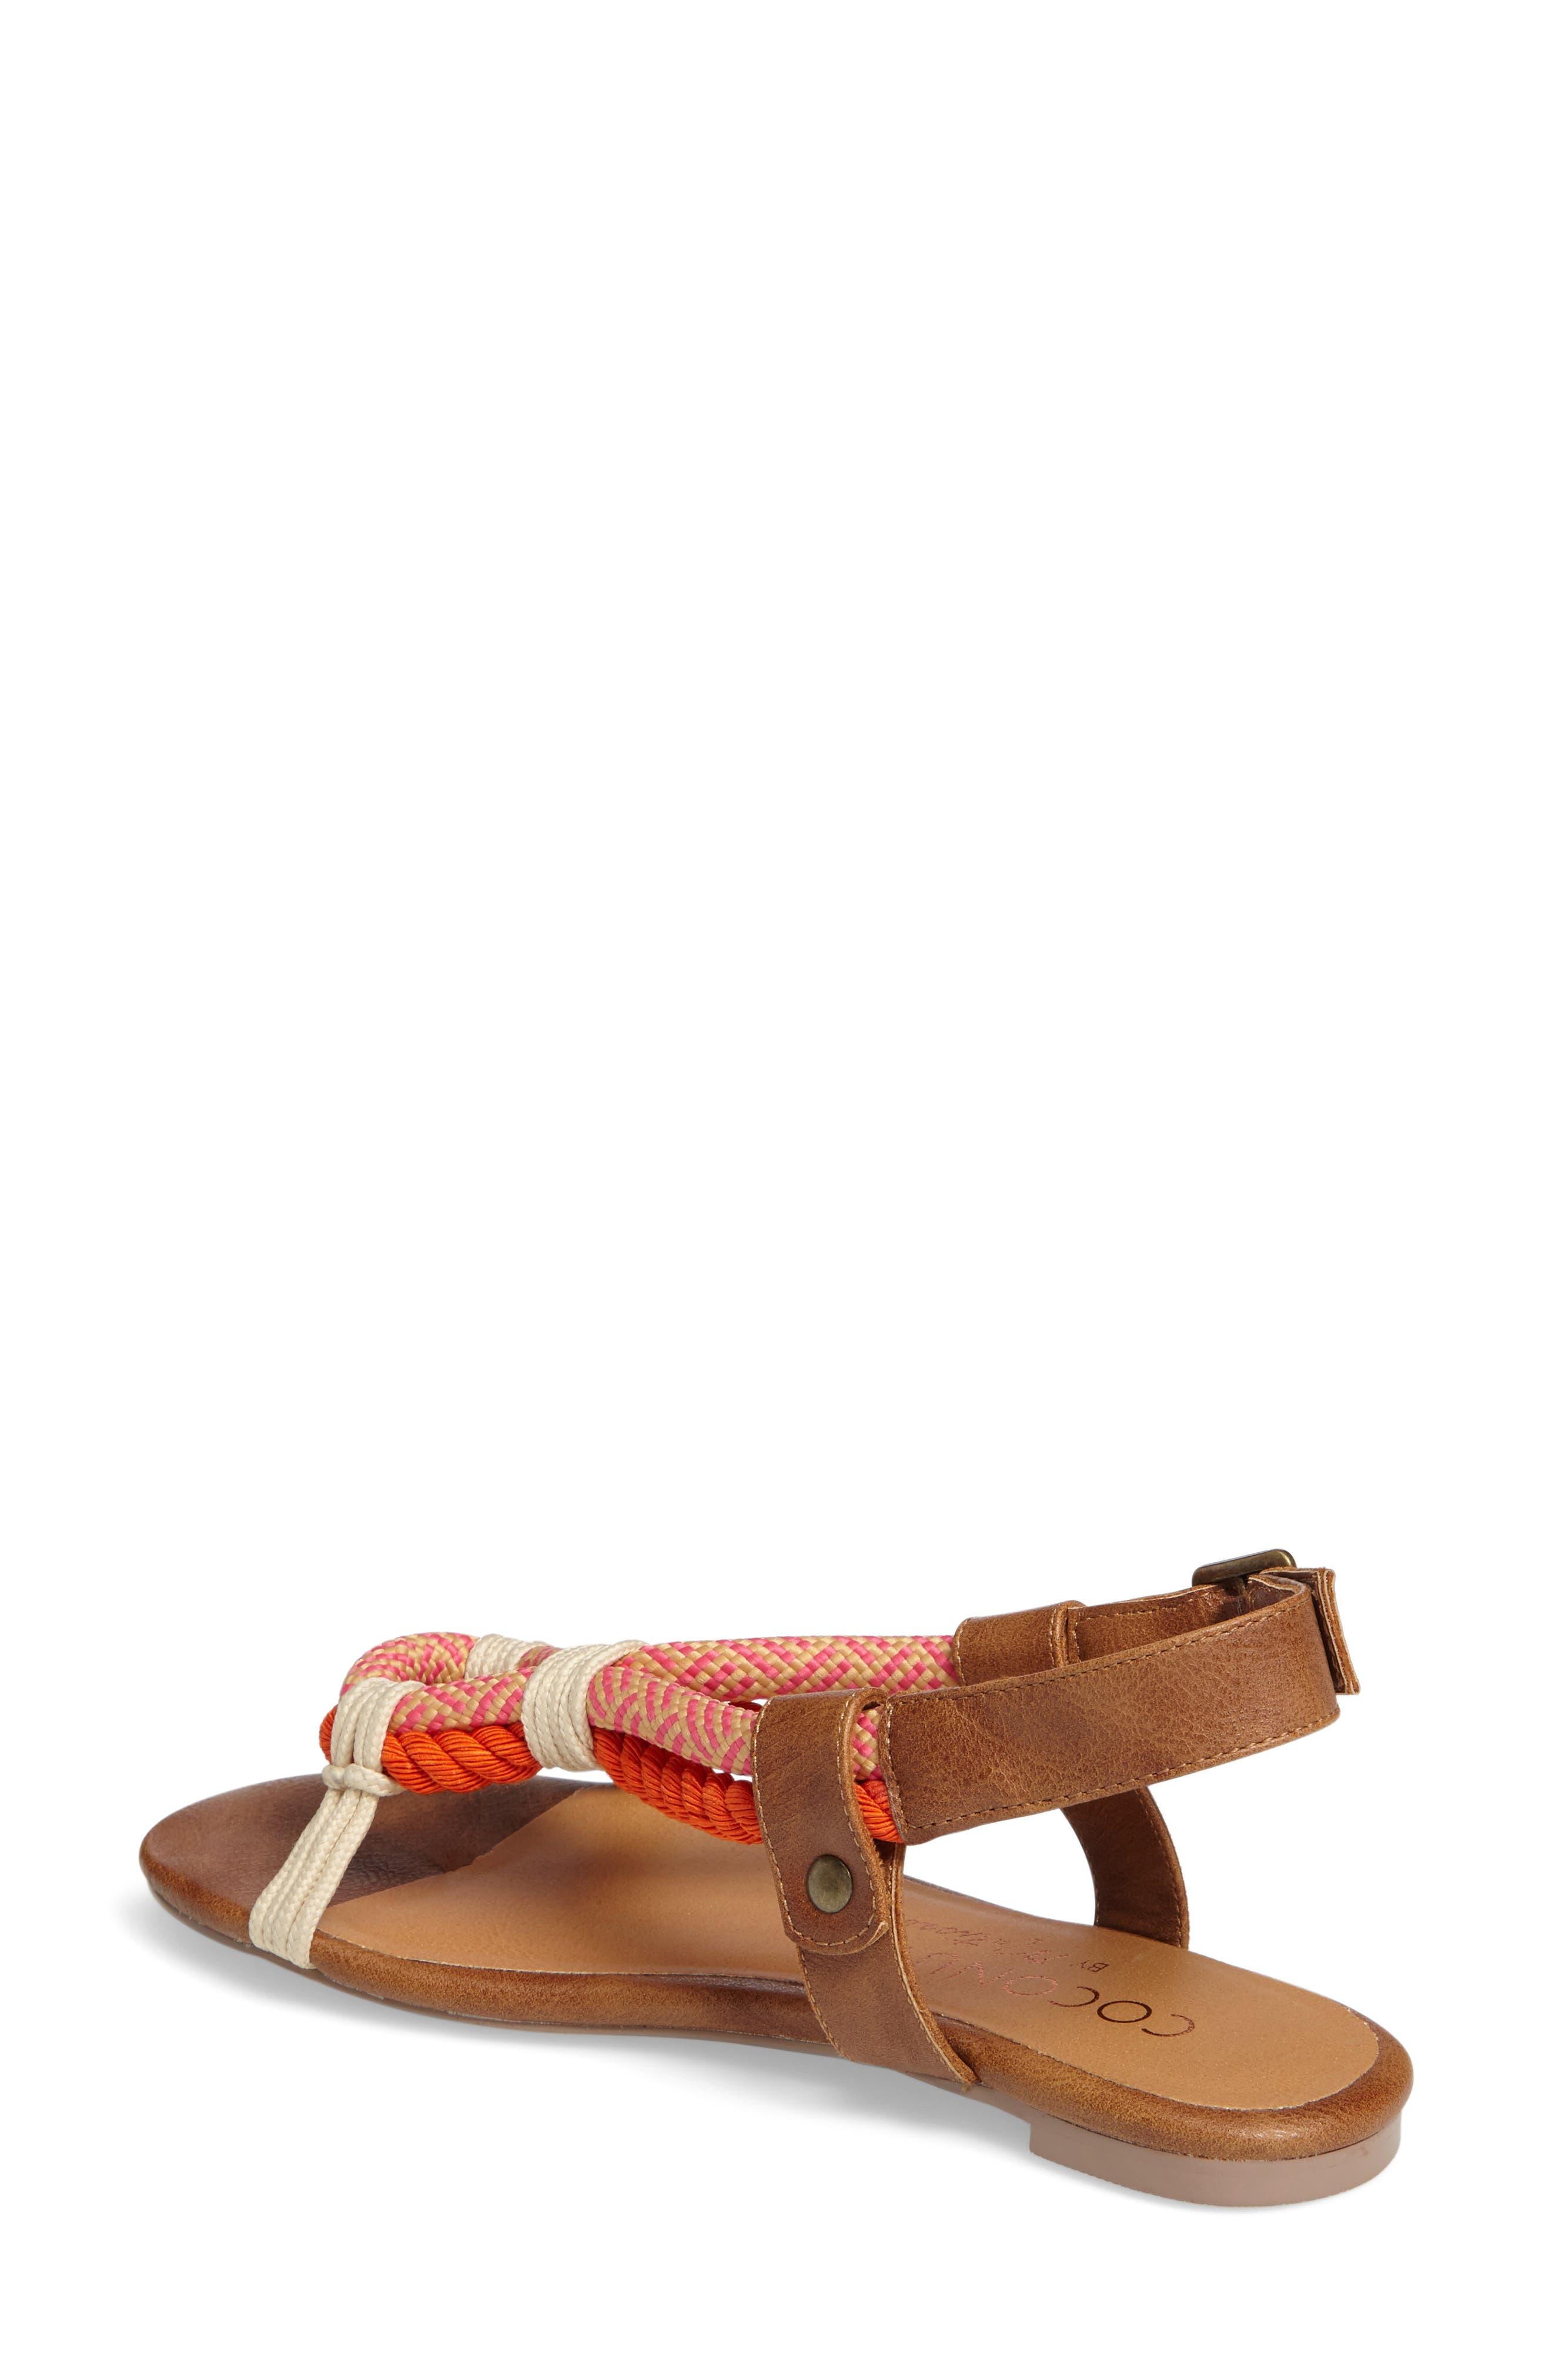 Alternate Image 2  - Matisse Parlay Sandal (Women)